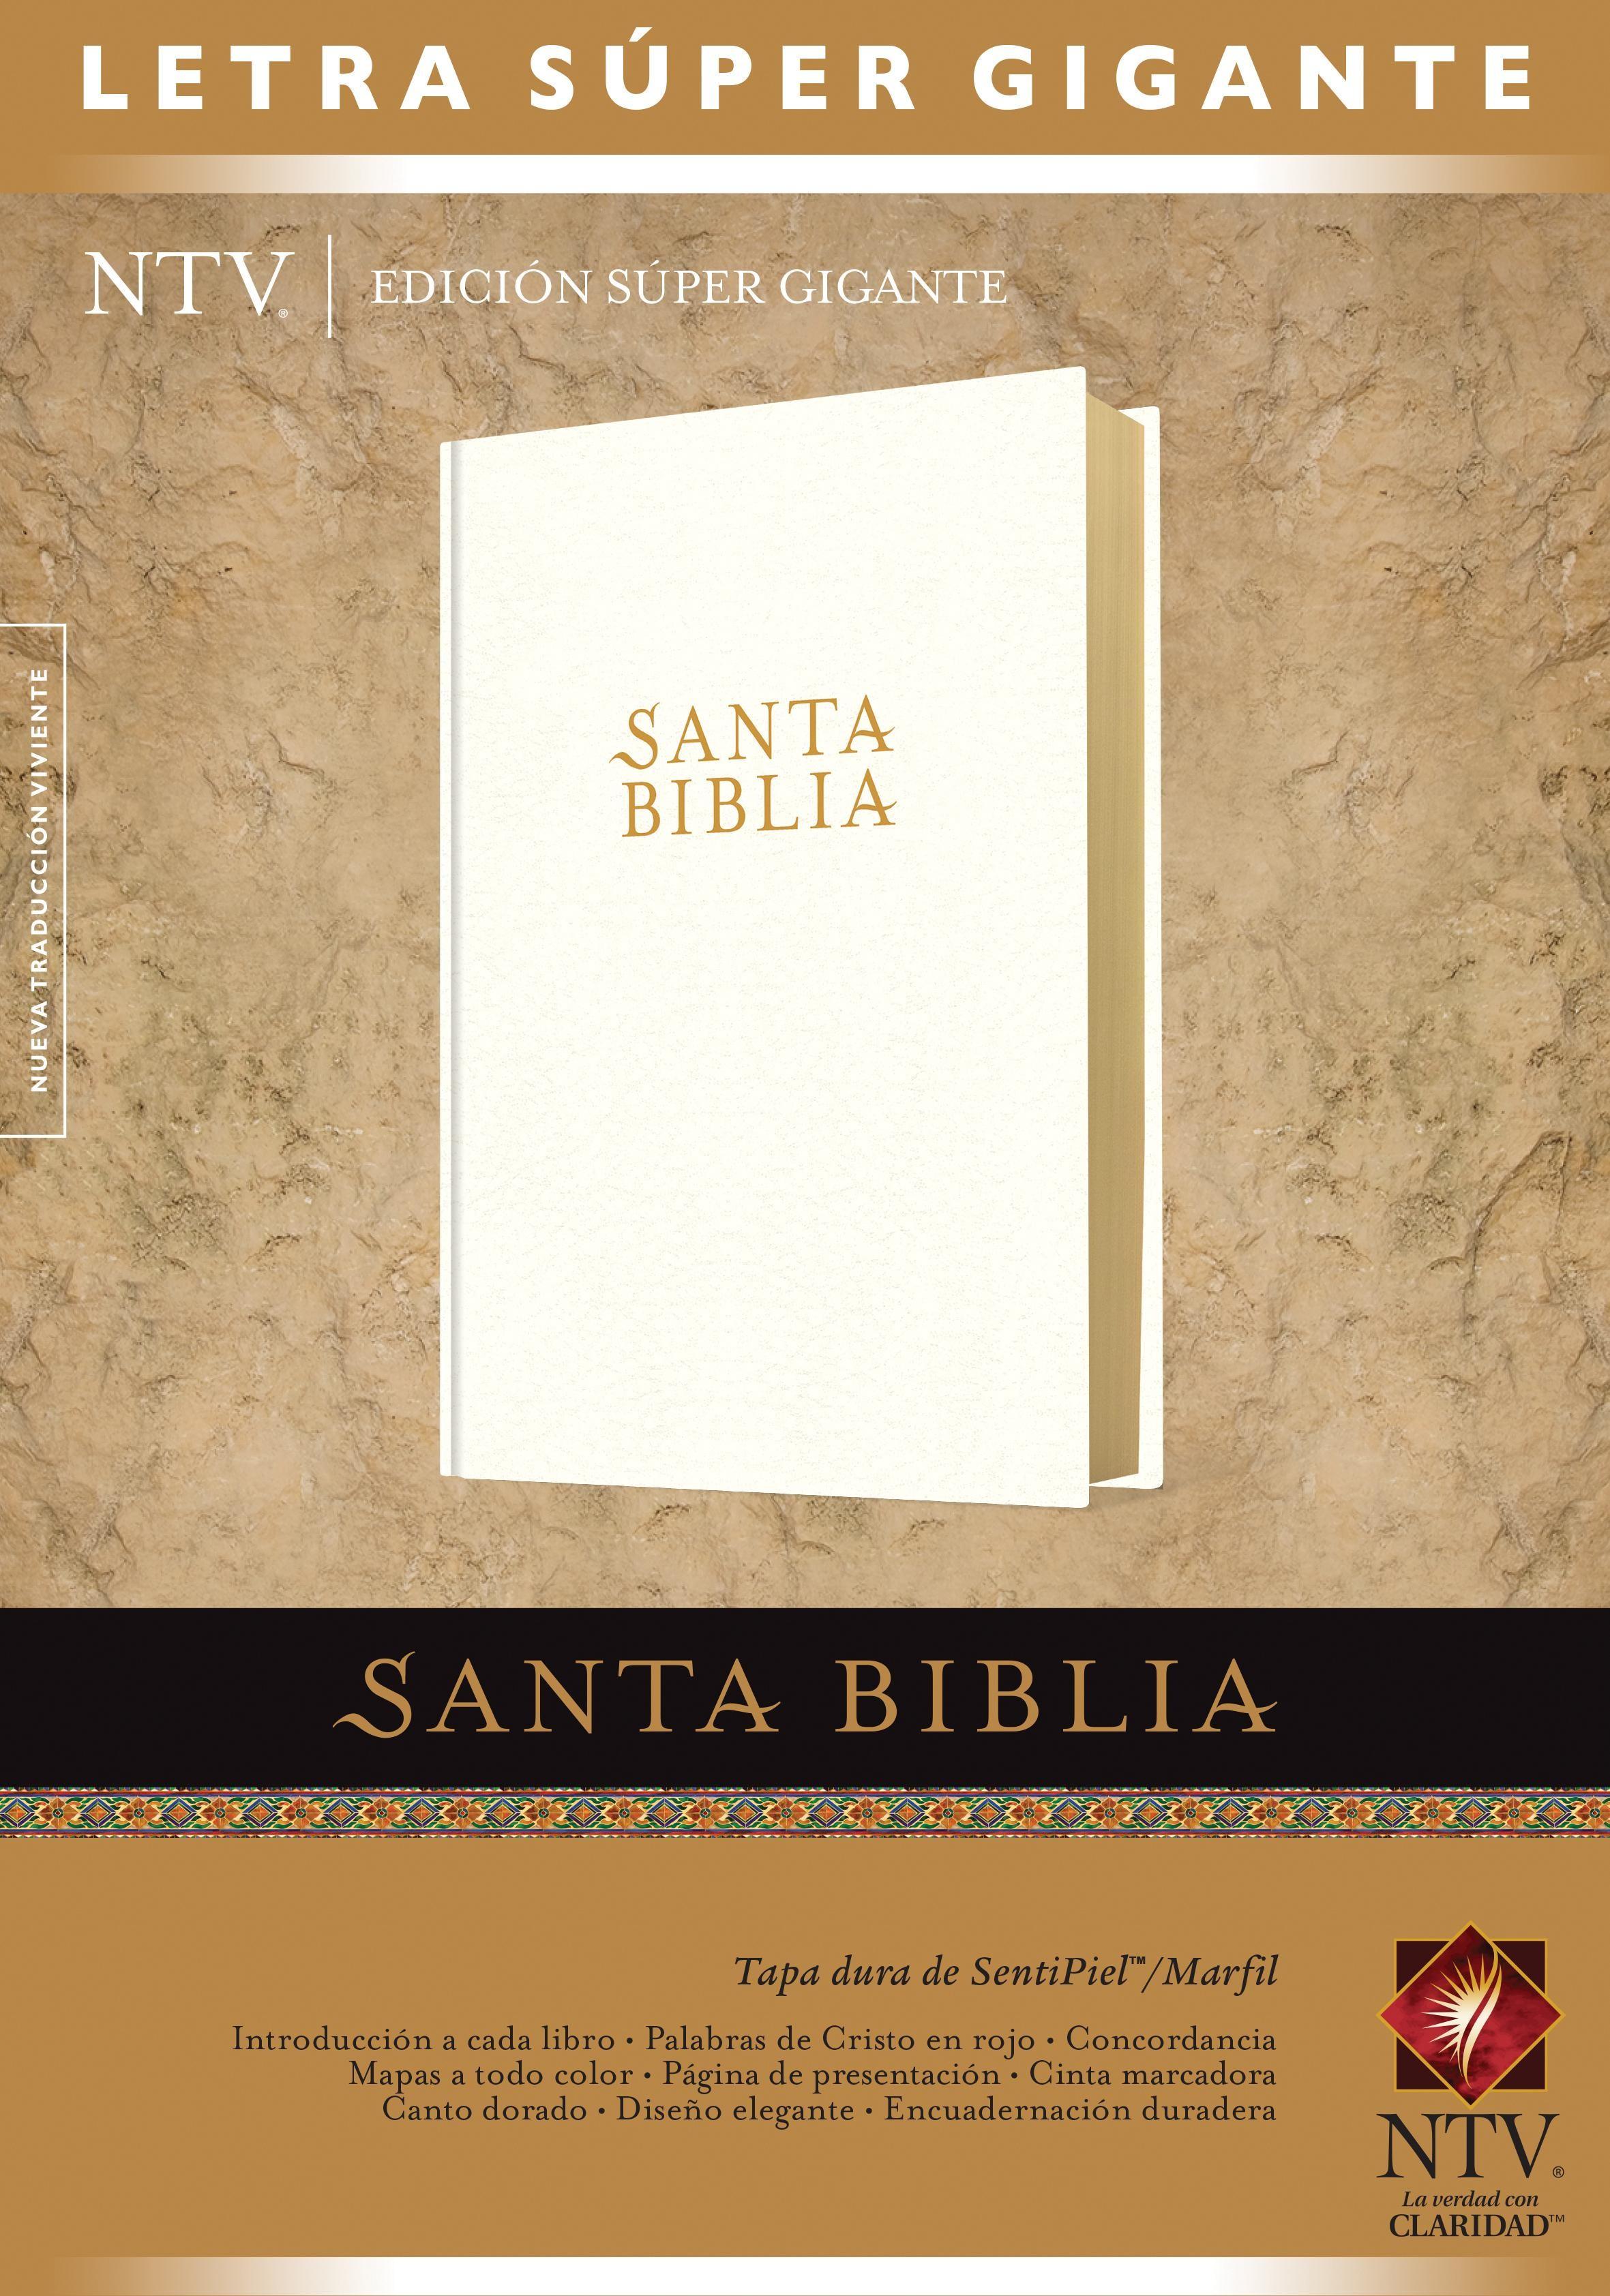 Santa Biblia NTV, Edición súper gigante (Letra Roja, SentiPiel, Marfil, Índice)